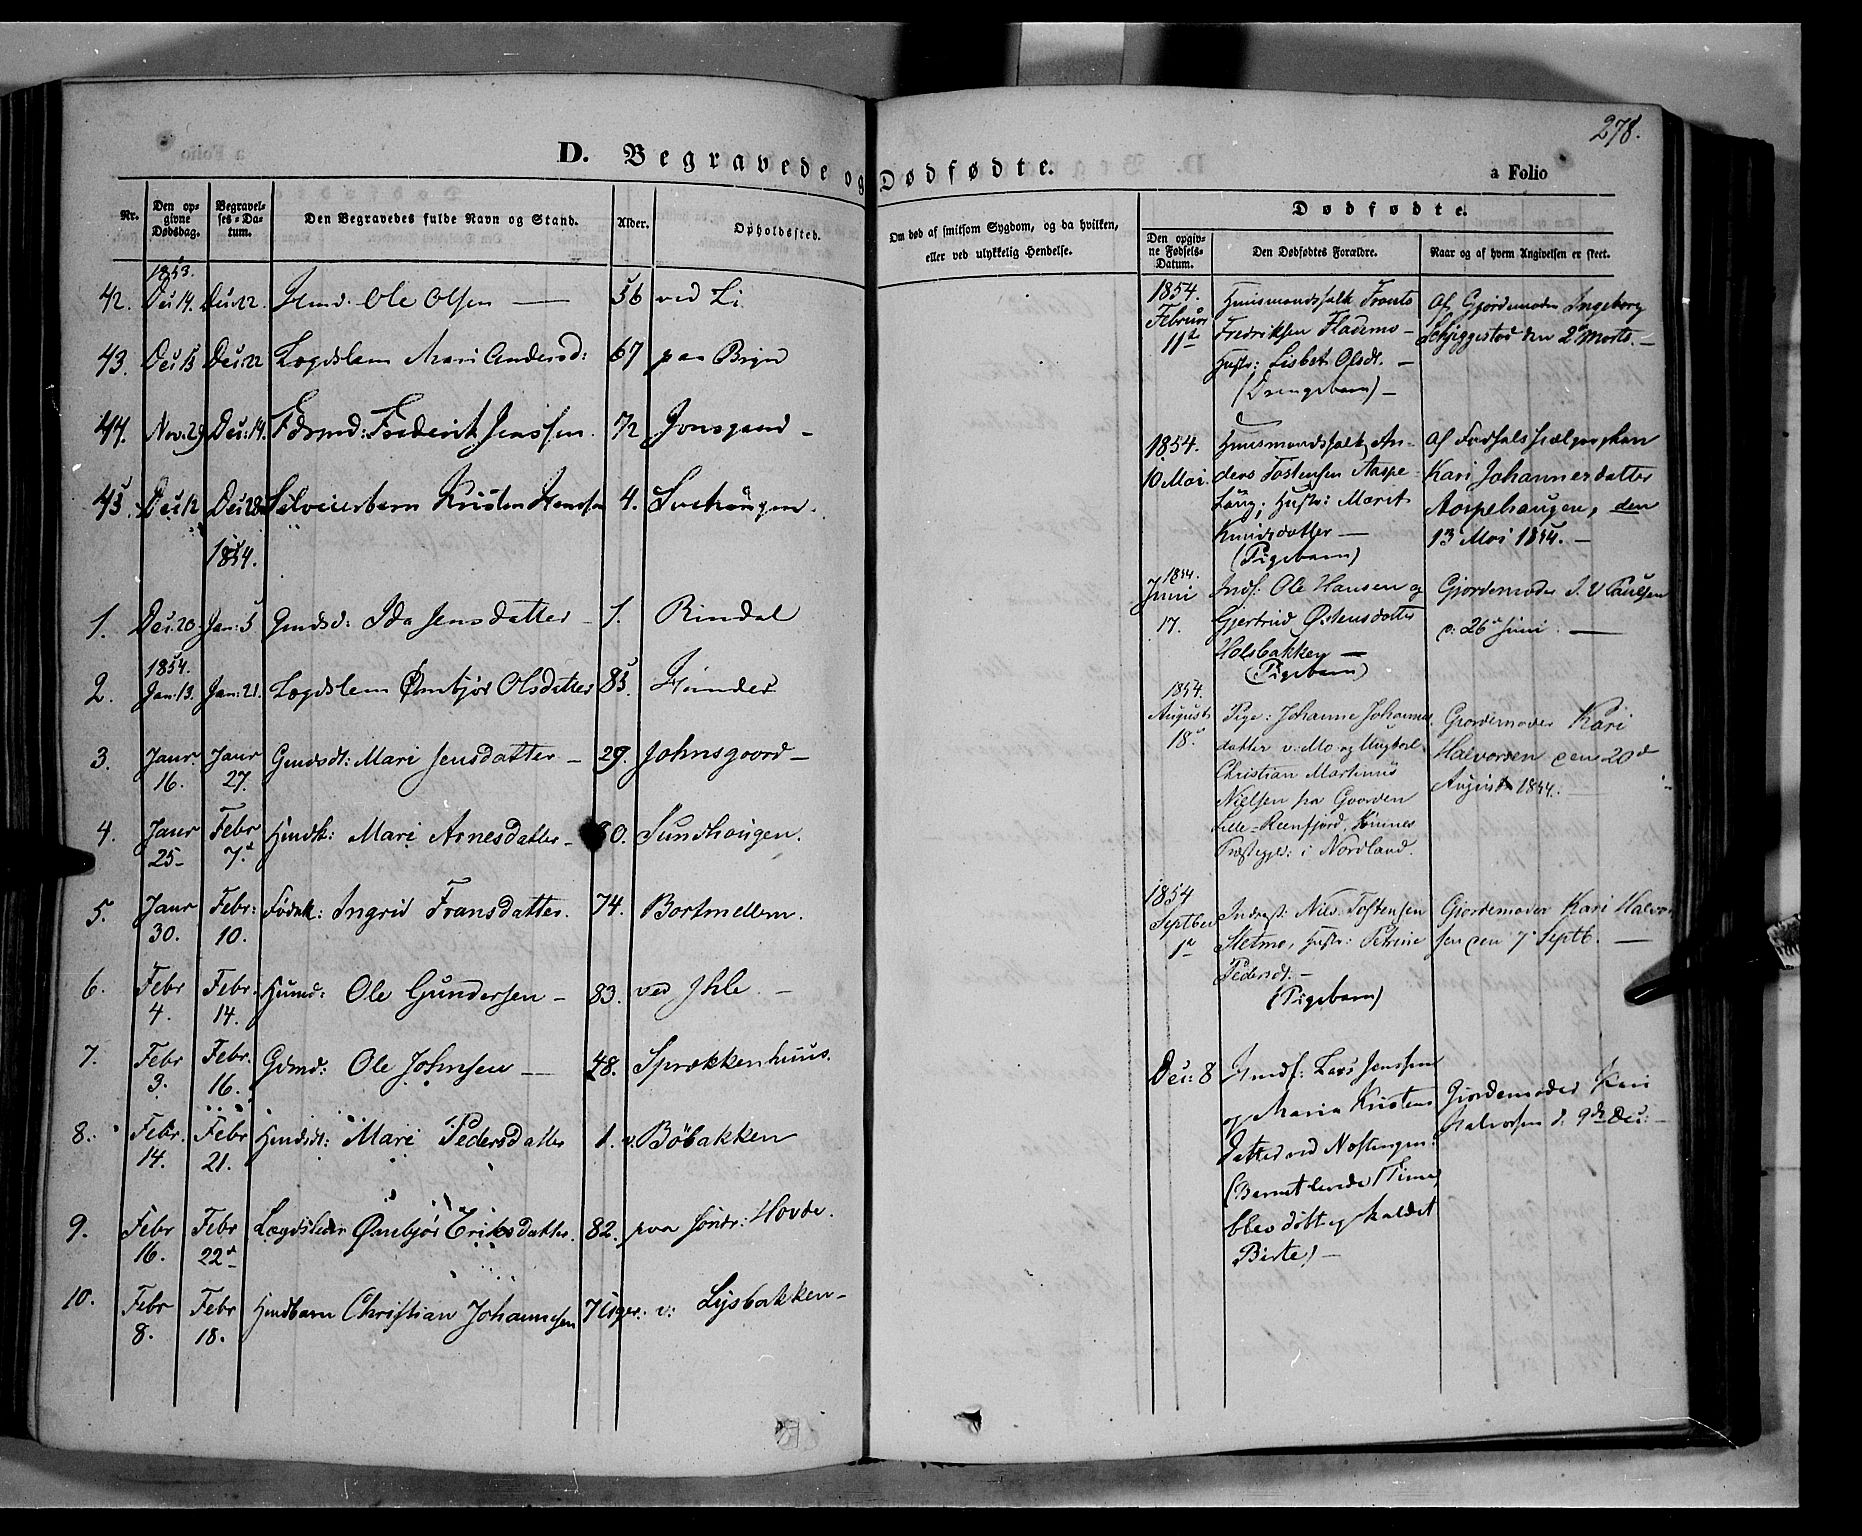 SAH, Øyer prestekontor, Ministerialbok nr. 5, 1842-1857, s. 278